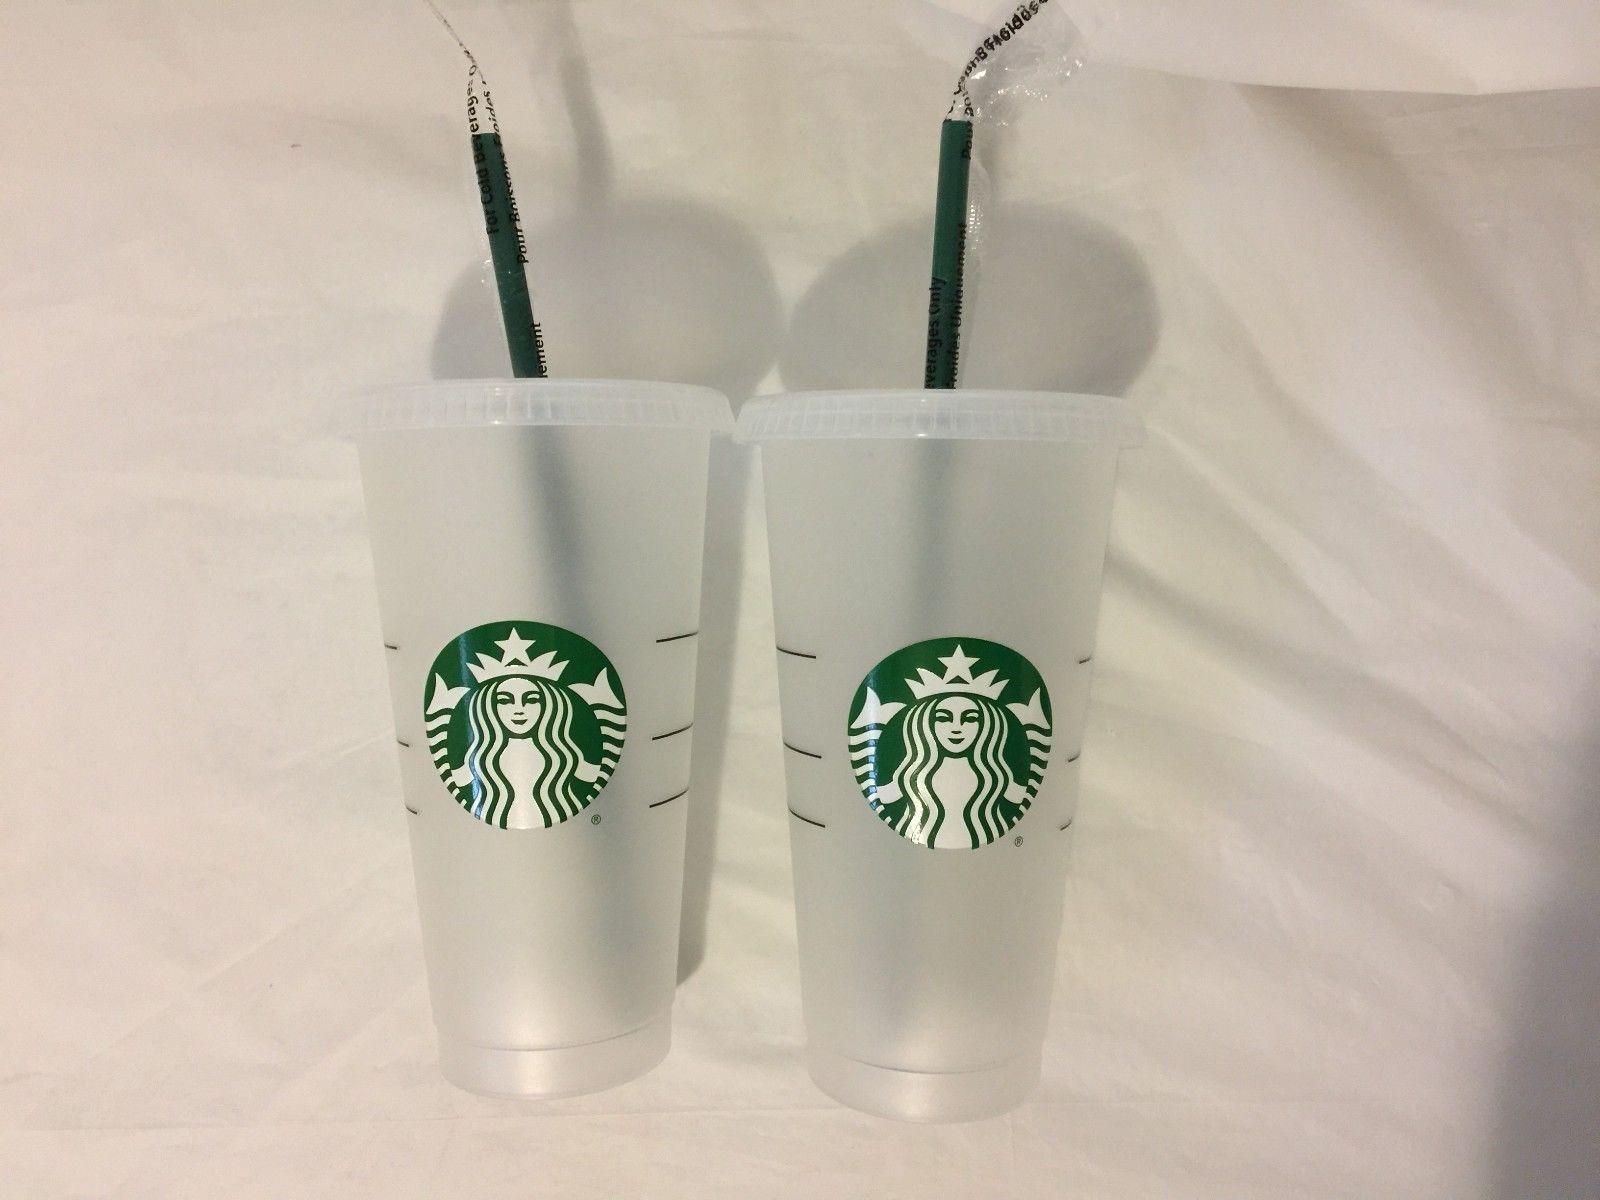 120733e28aa NEW 2018 Starbucks Reusable 24oz Cold Cup and 50 similar items